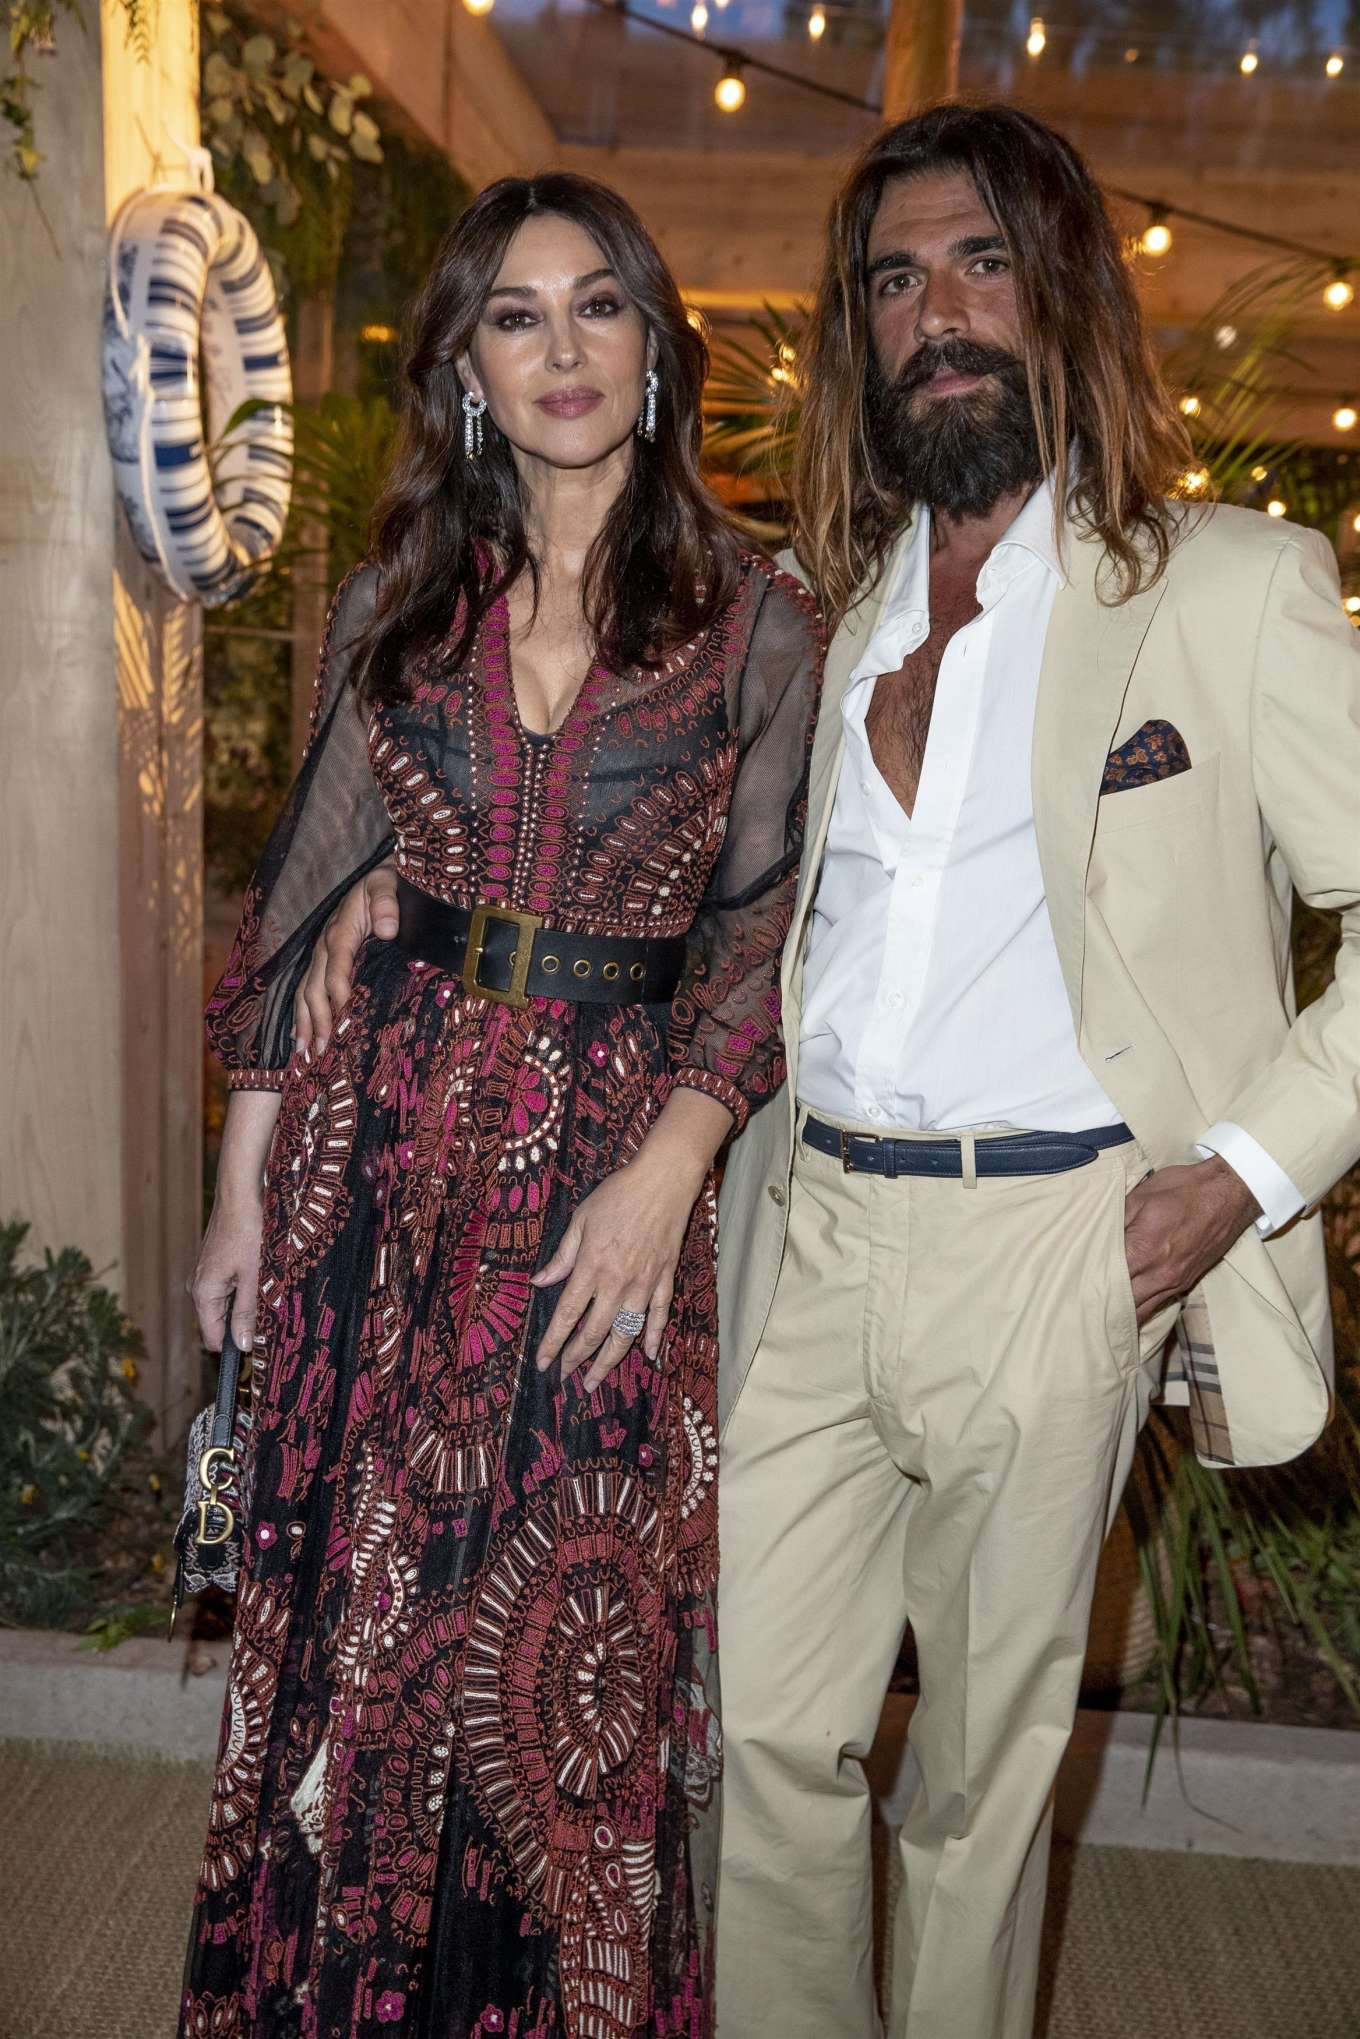 Monica Bellucci 2019 : Monica Bellucci: Dior x Vogue Party at 2019 Cannes Film Festival-03